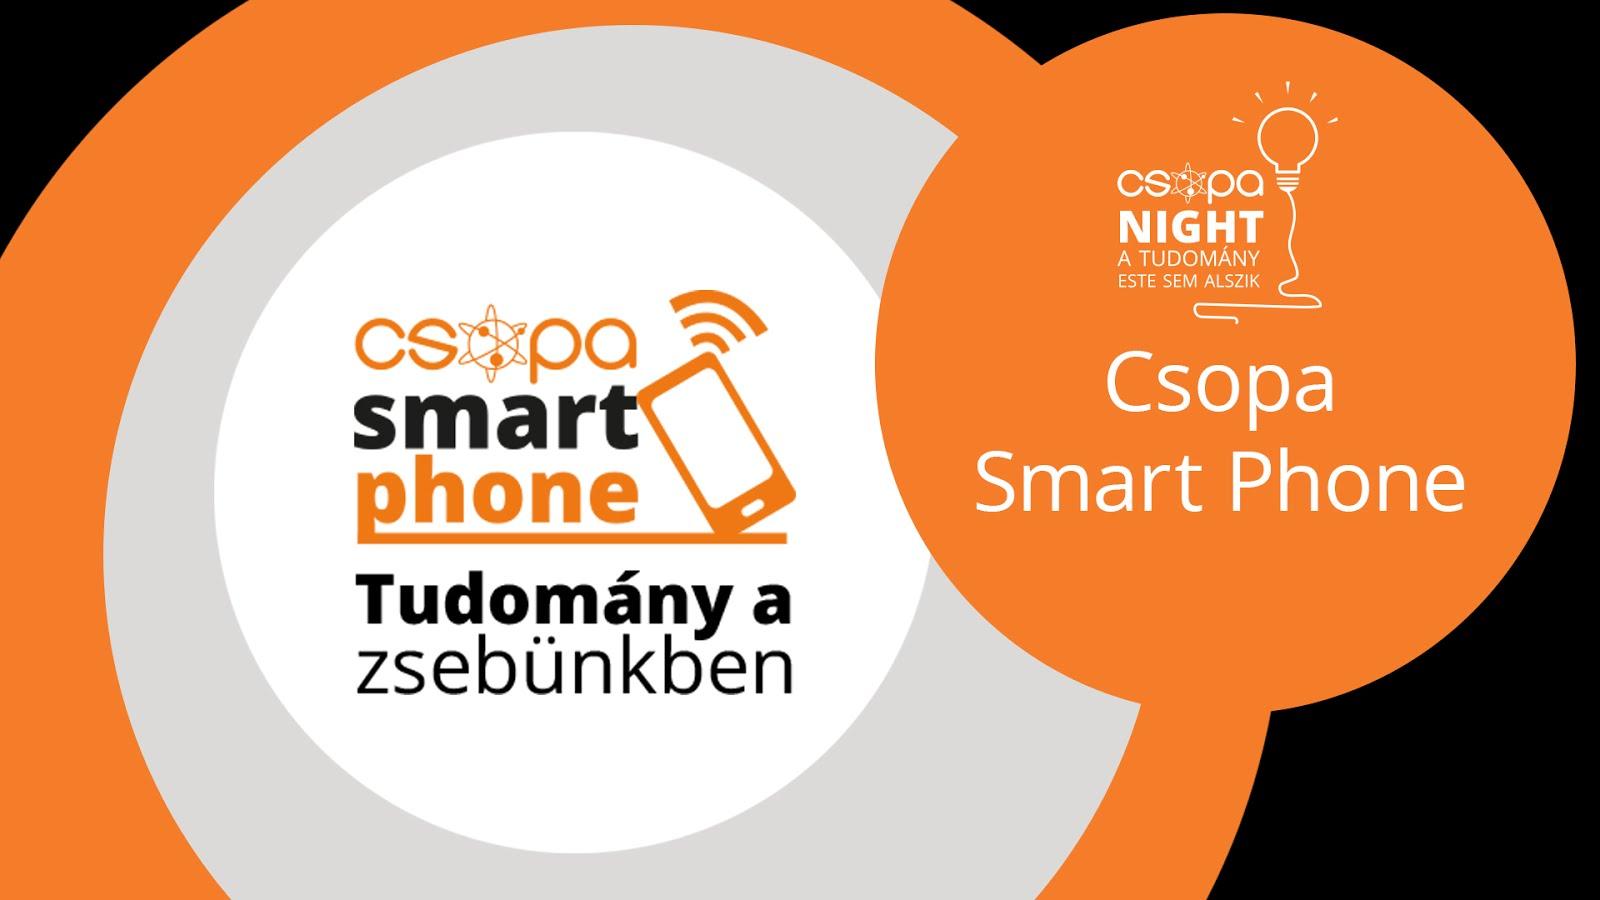 Csopa Smart Phone